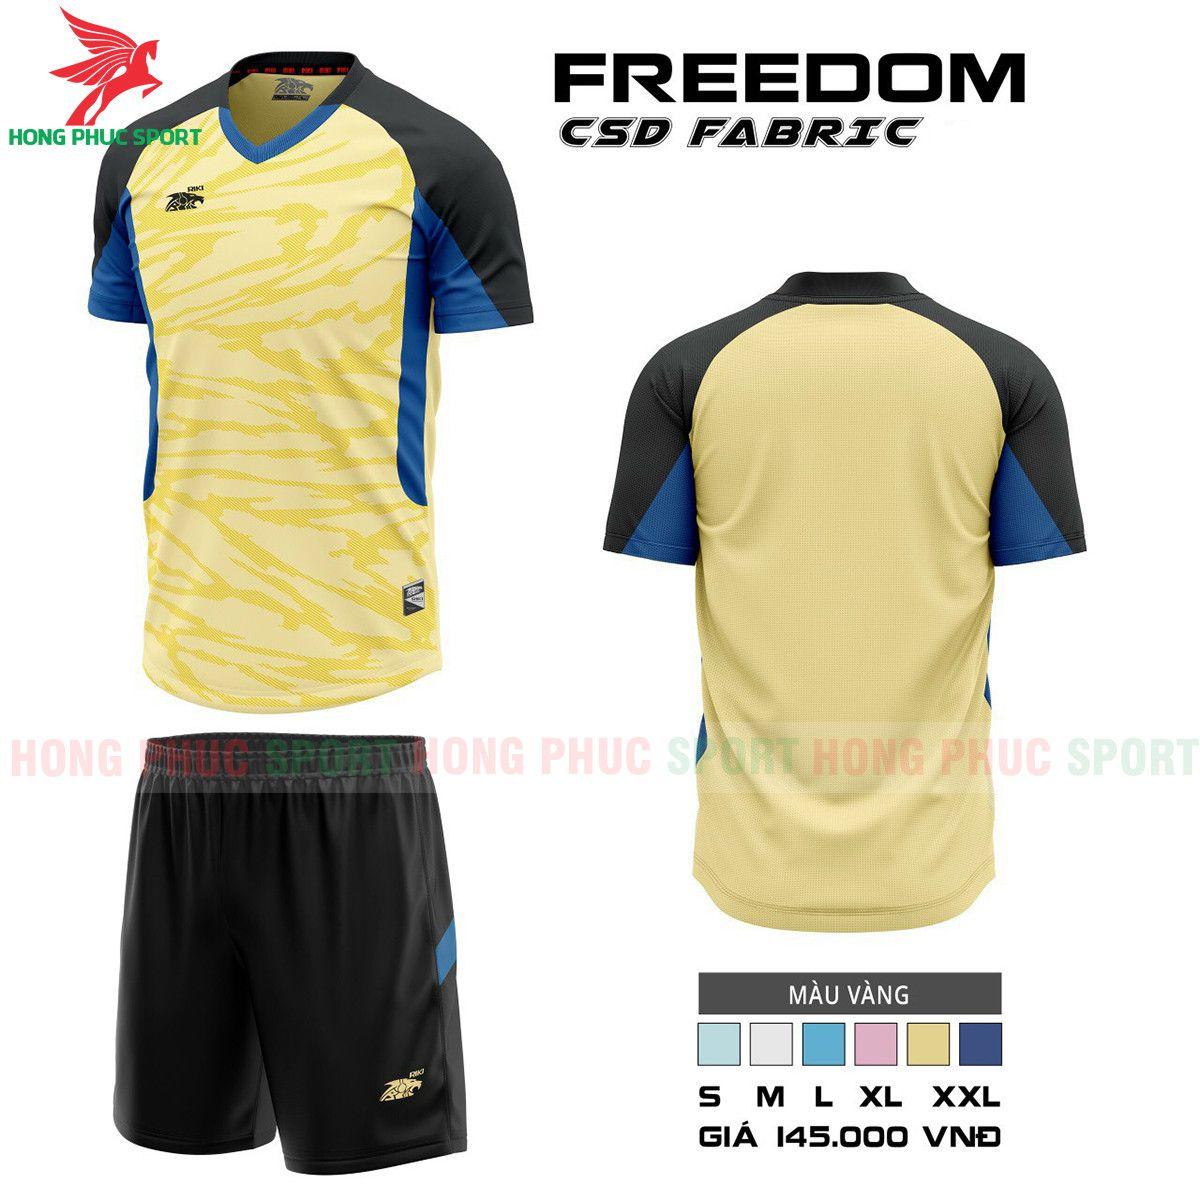 https://cdn.hongphucsport.com/unsafe/s4.shopbay.vn/files/285/ao-khong-logo-riki-freedom-2021-mau-vang-1-6156830e872d8.jpg